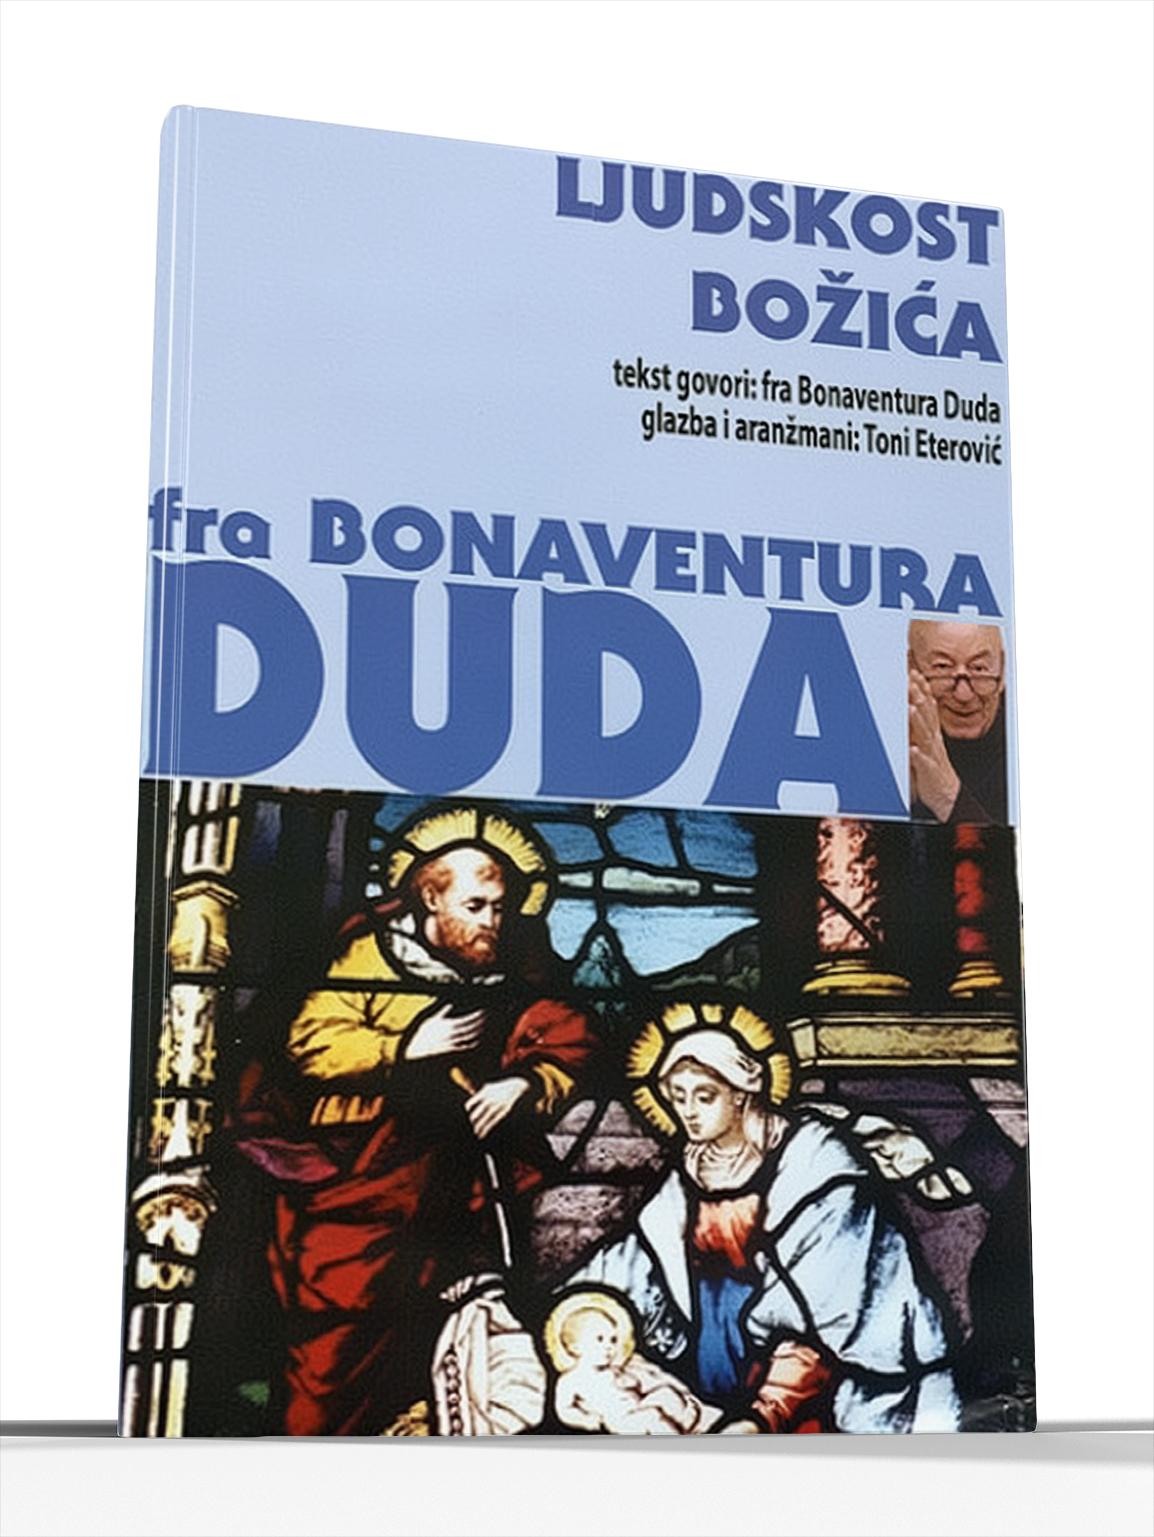 LJUDSKOST BOŽIĆA - fra Bonaventura Duda